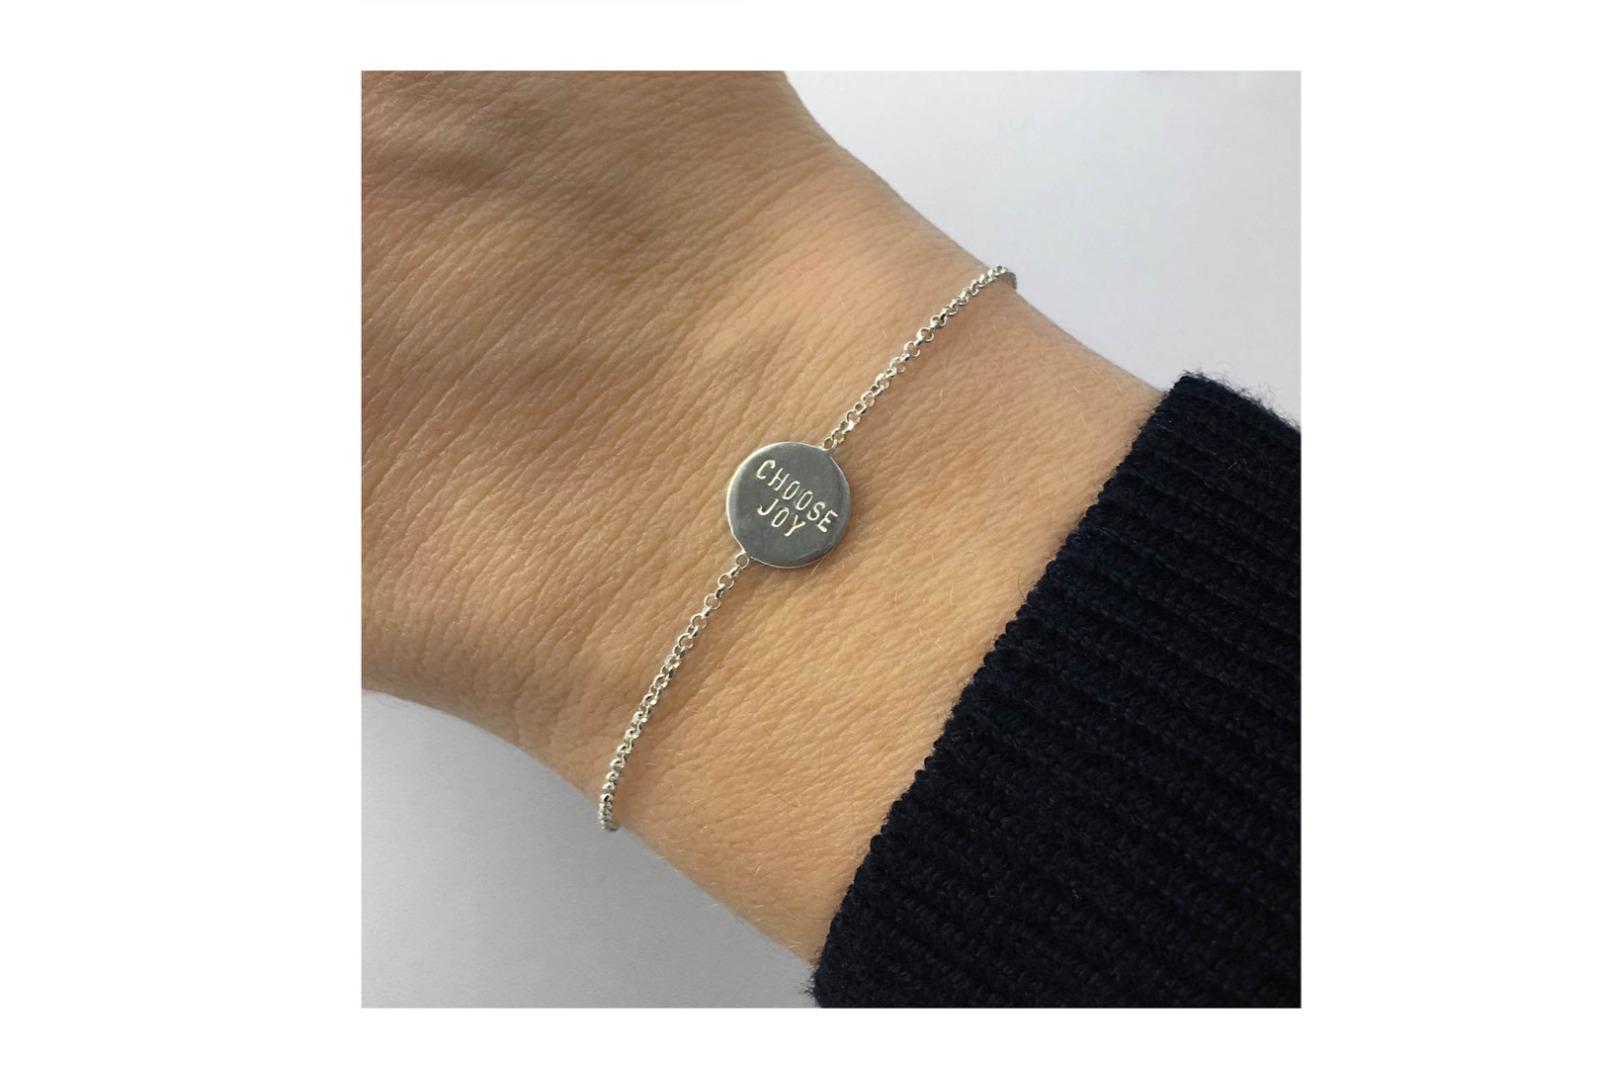 Zartes Silberarmband 2 - Namens- Geburts-